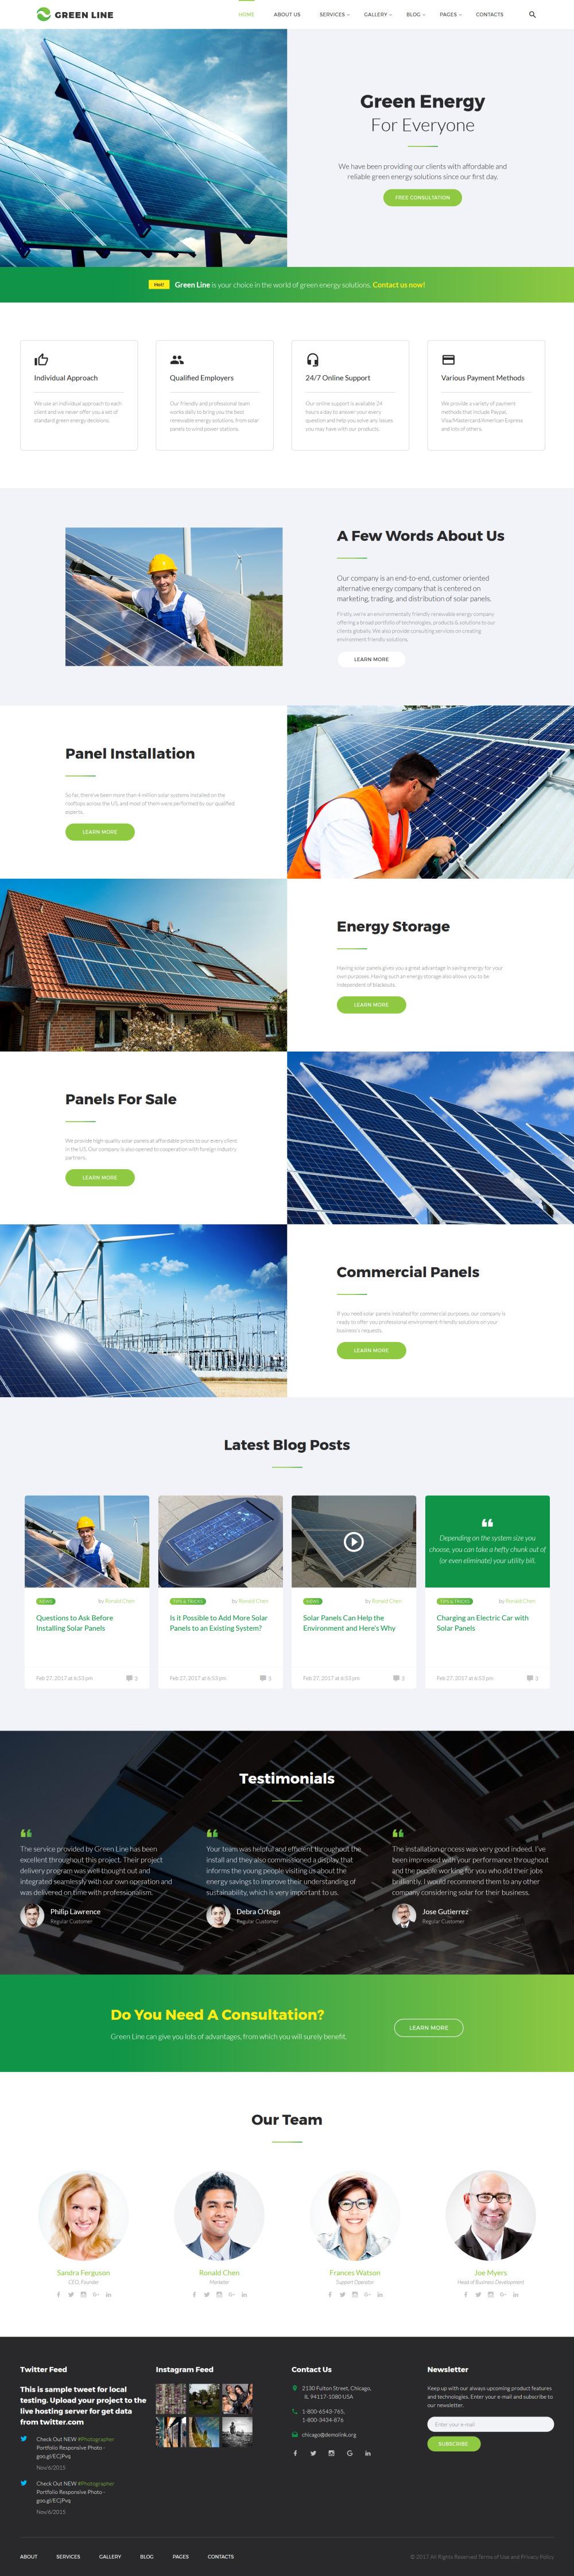 Alternative Power Website Template | Website Templates